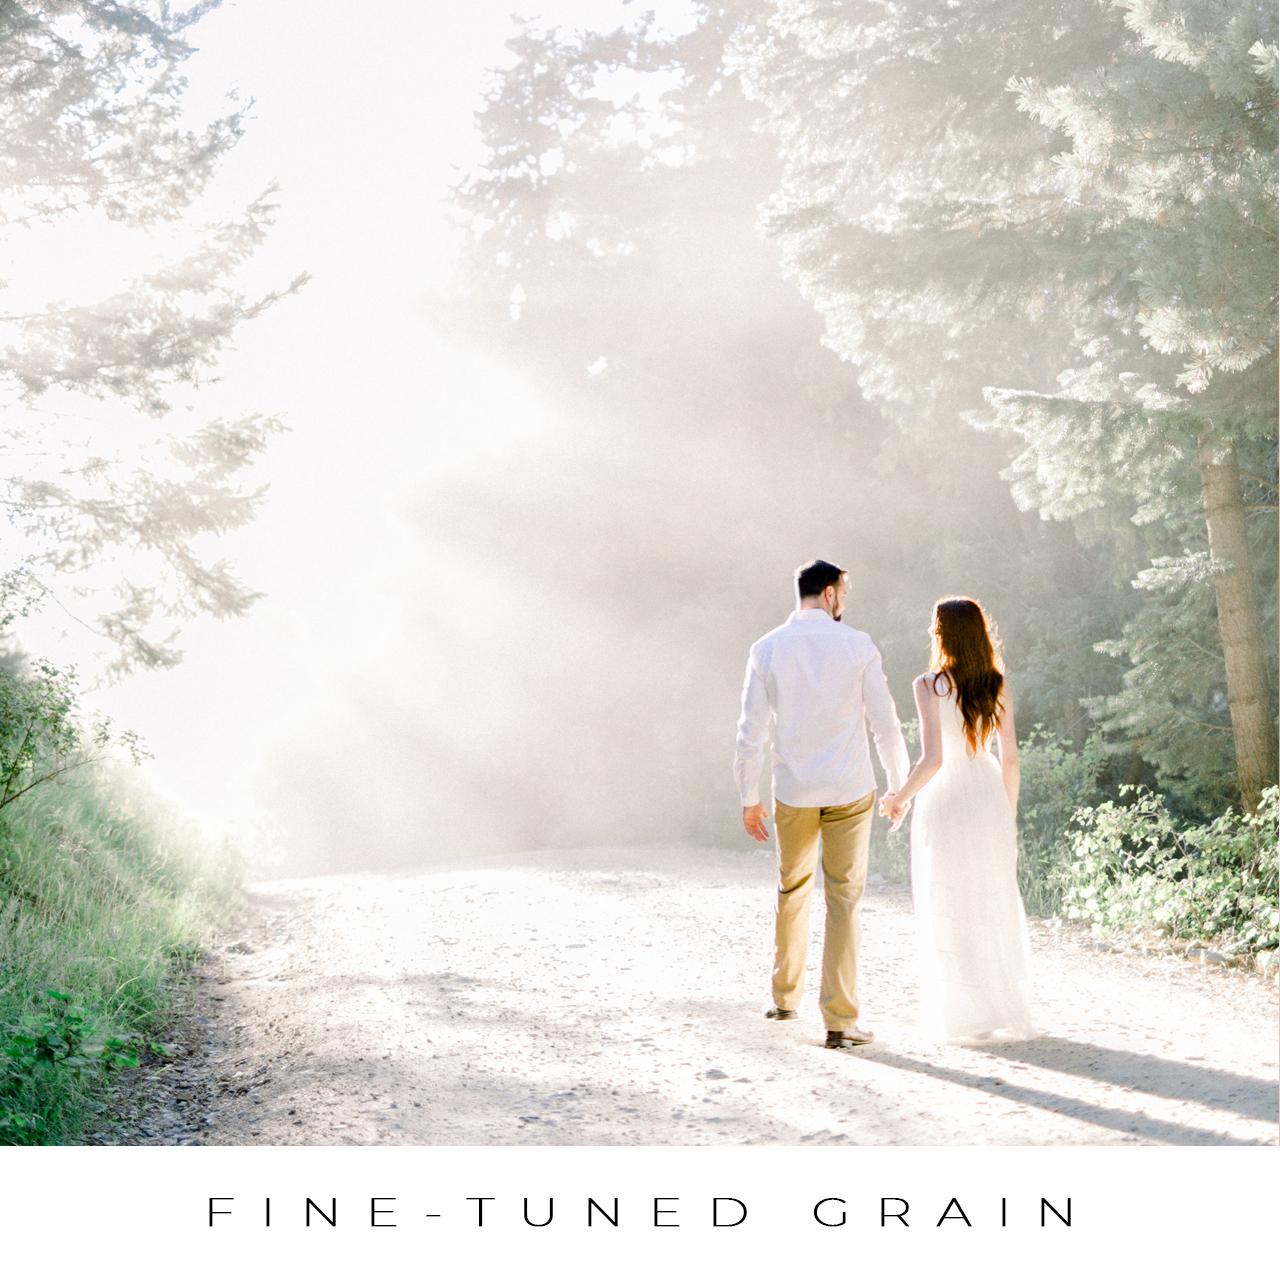 FINE-tuned-grain.jpg